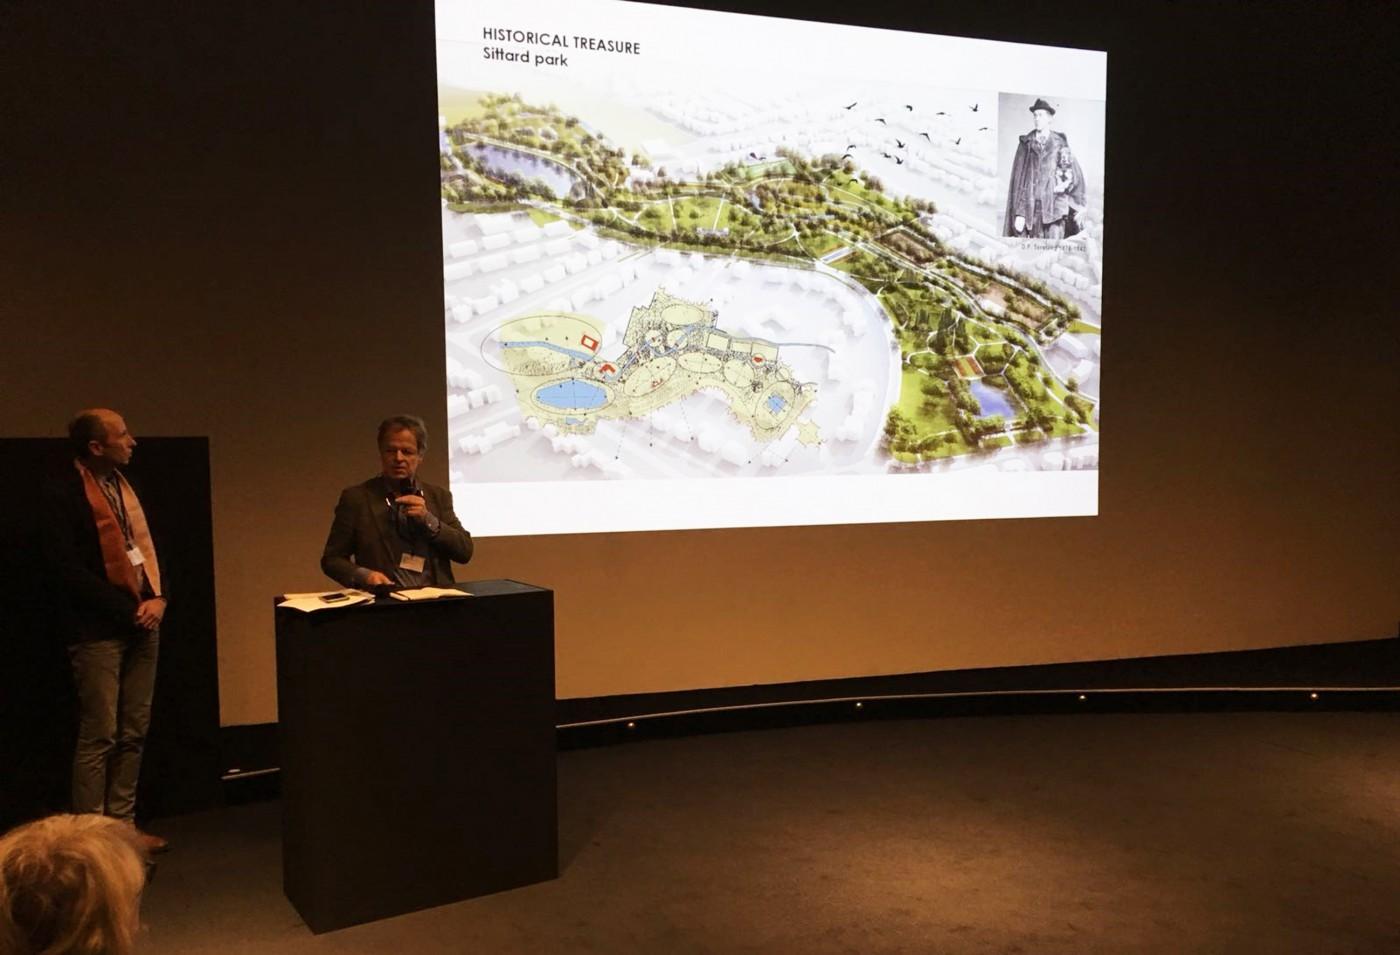 buro-sant-en-co-landschapsarchitectuur-pitching-prague-charles-square-karlova-nemesti